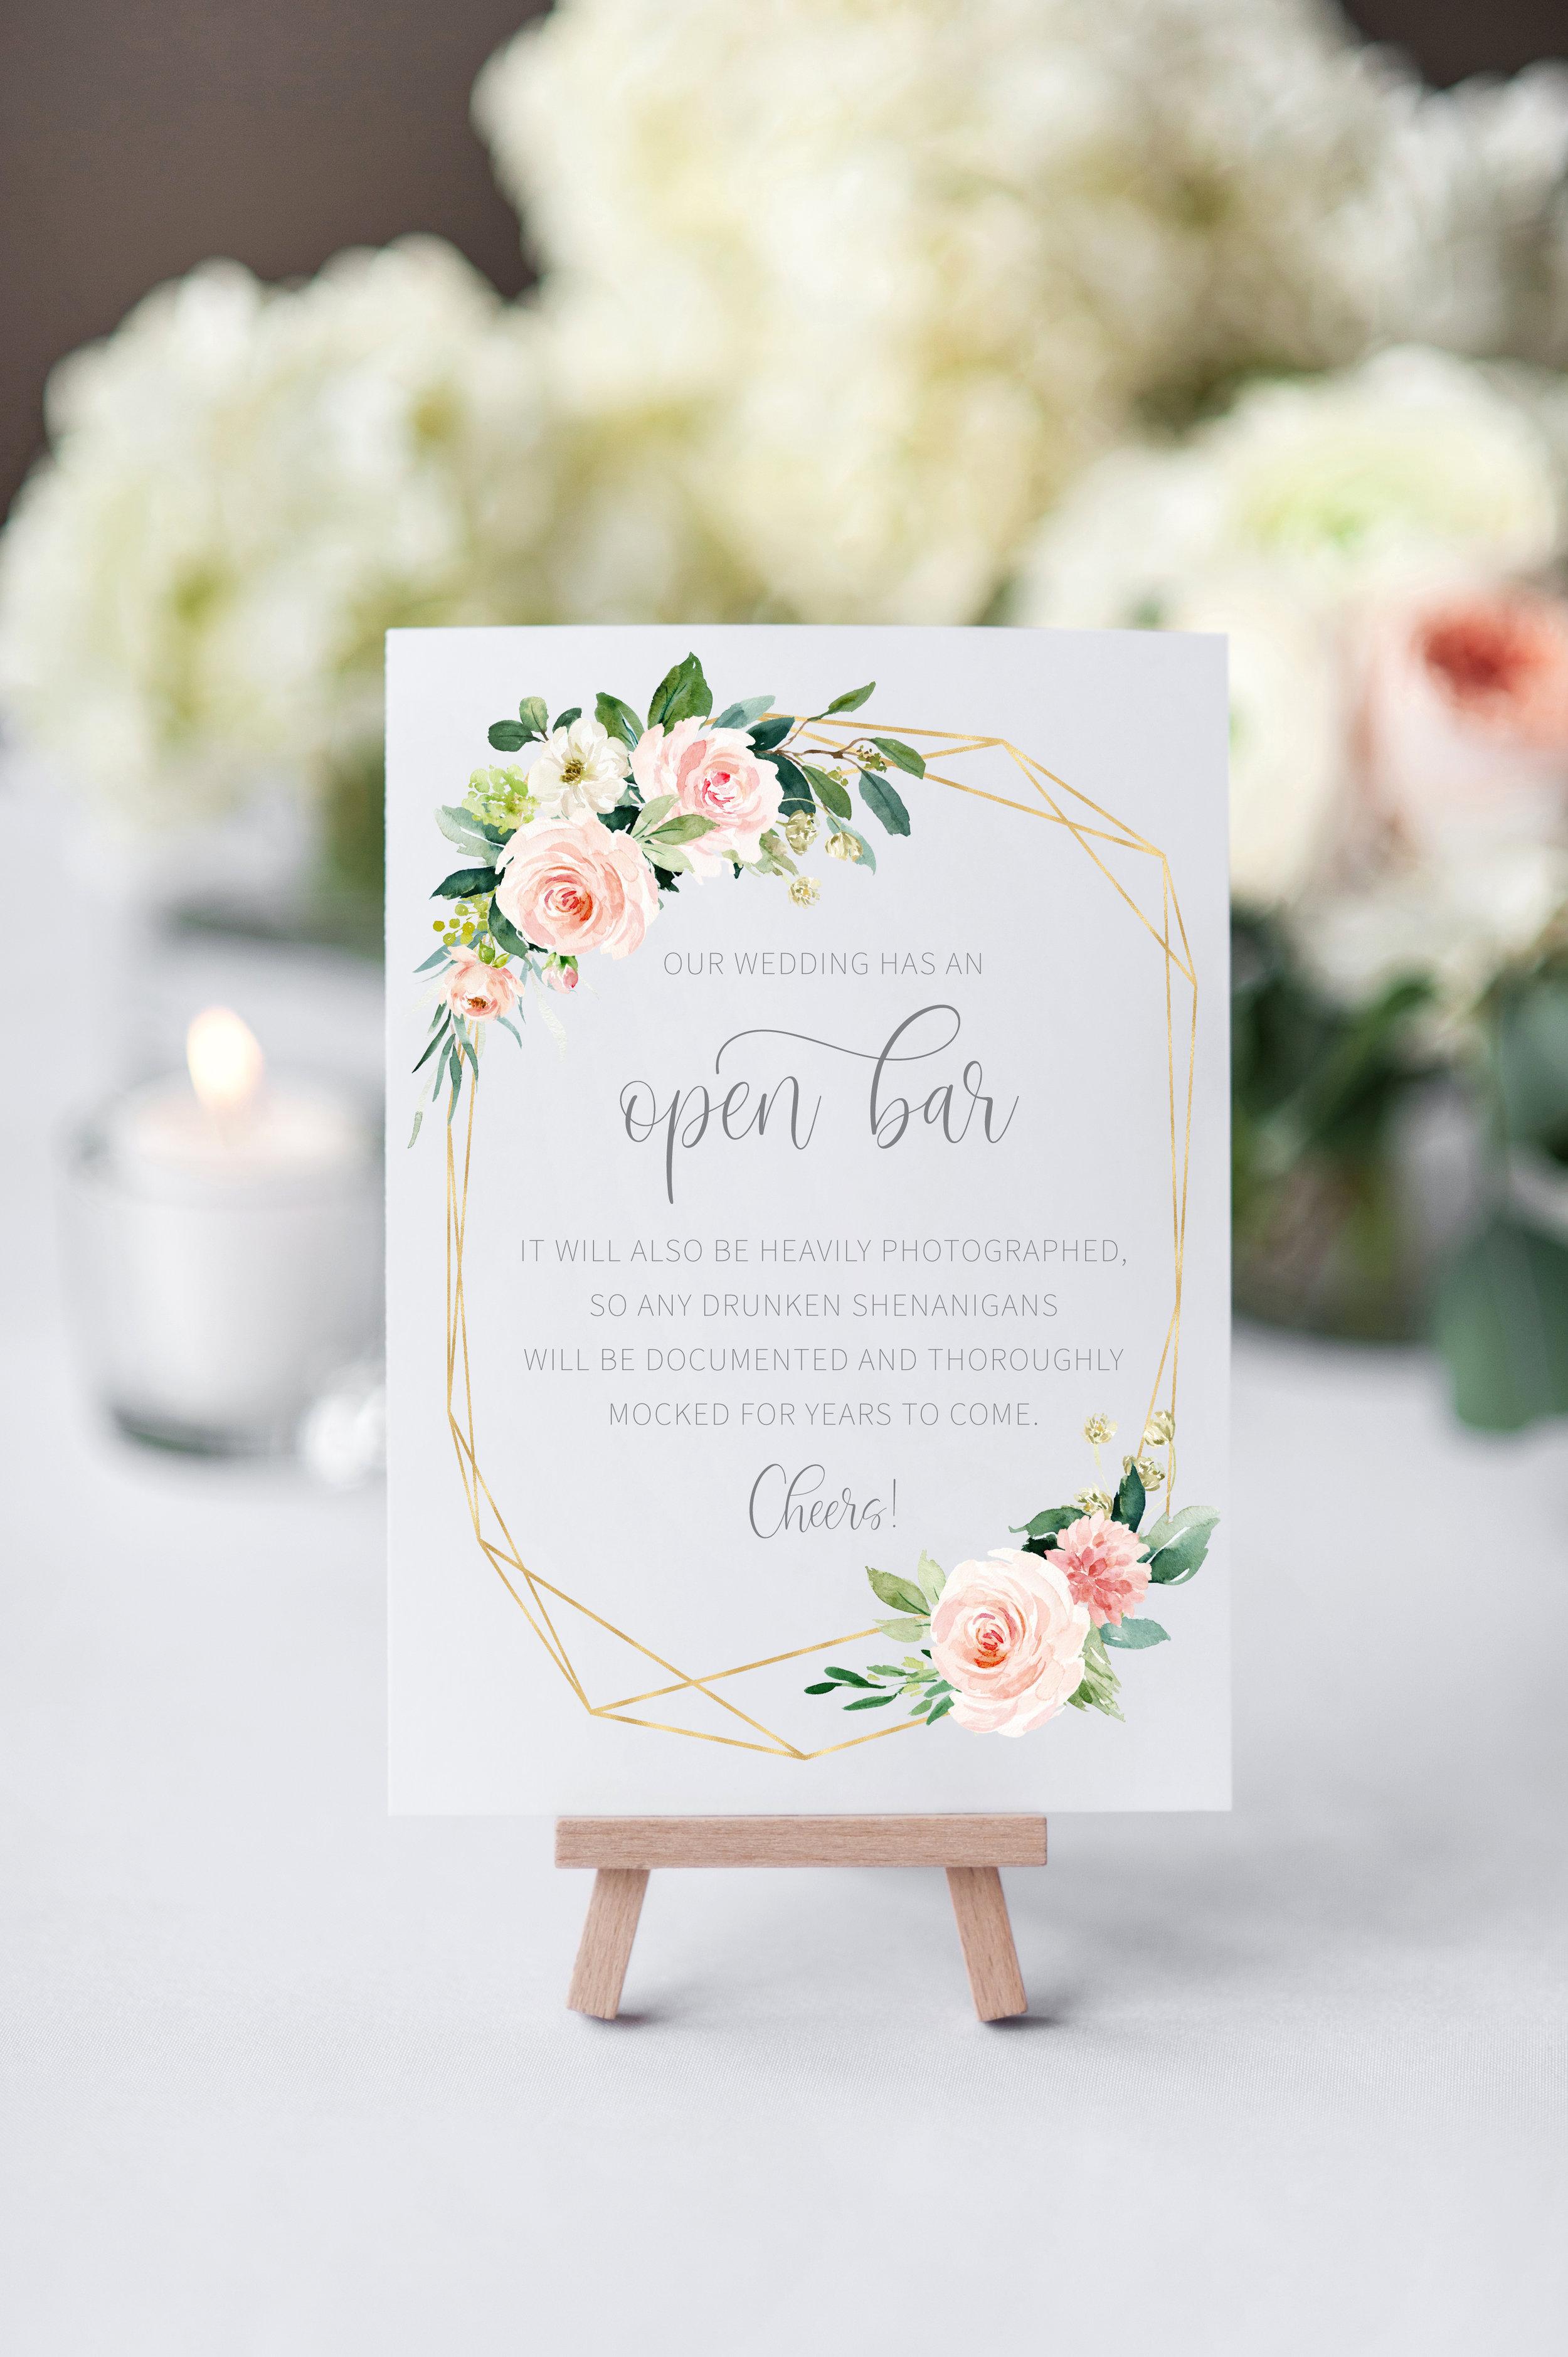 Blush Cream Floral Watercolor Wedding Open Bar Sign 1 (1).jpg